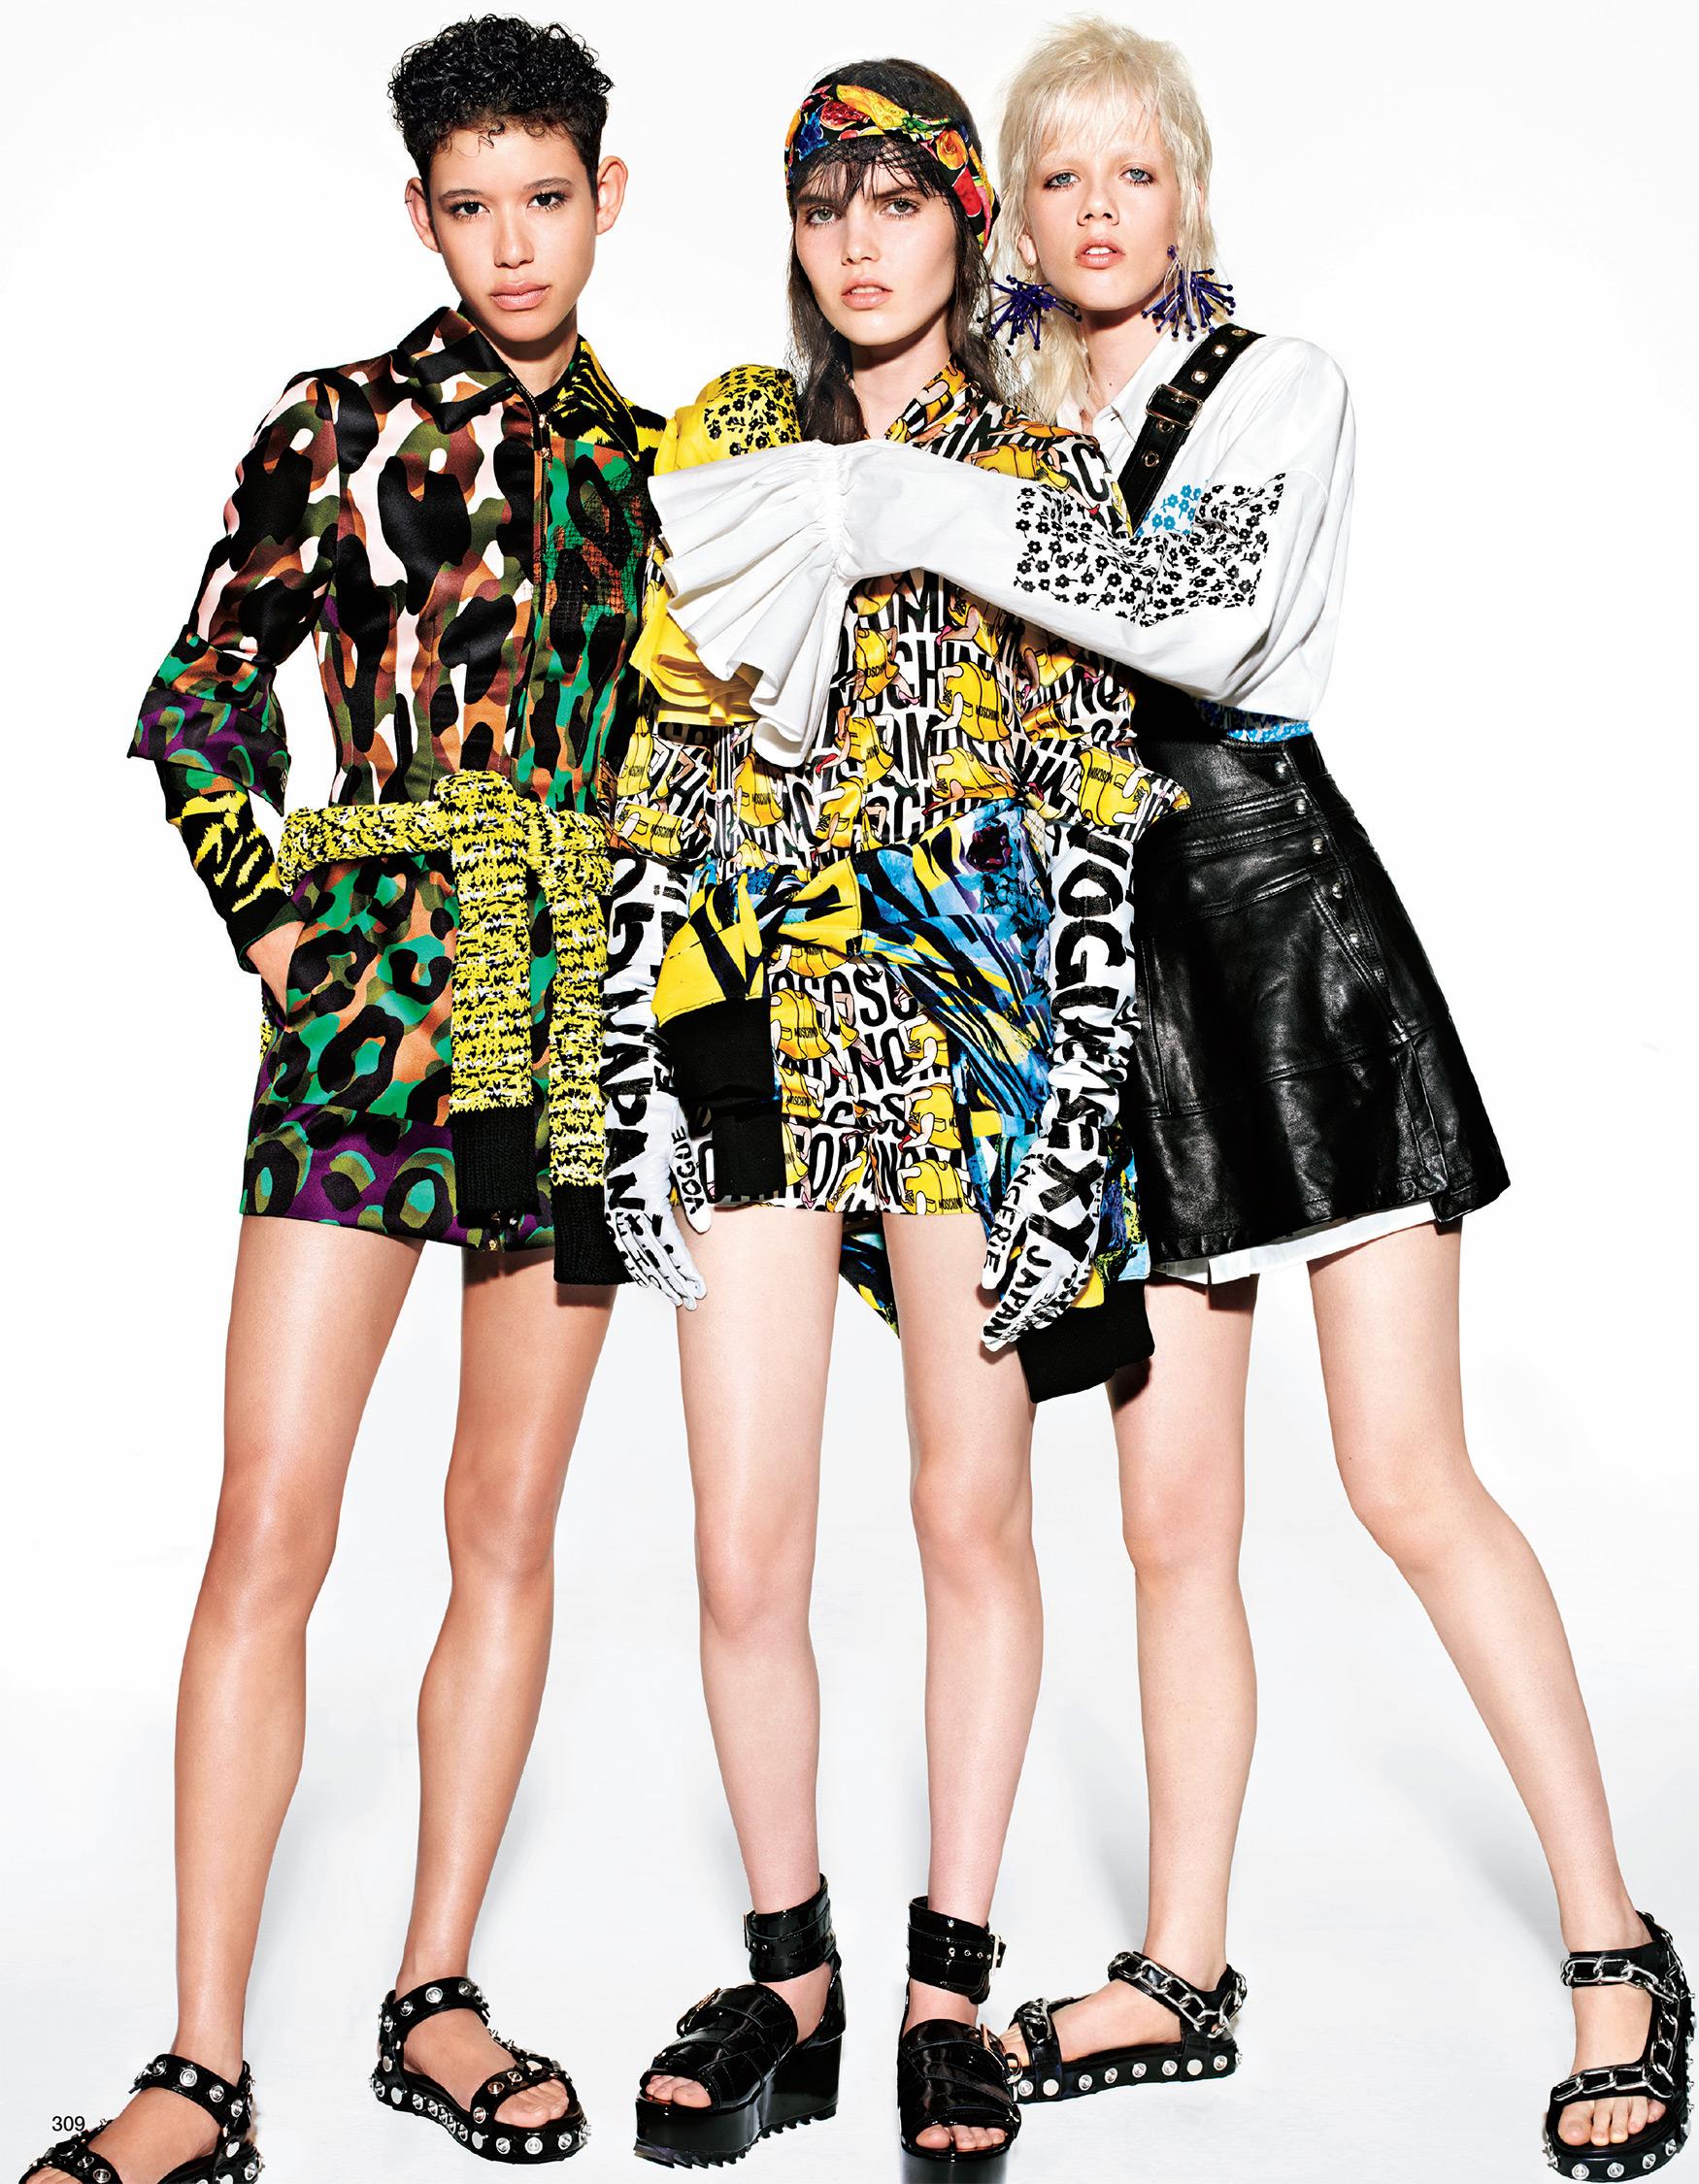 Giovanna-Battaglia-Vogue-Japan-The-Geek-Girls-Society-Richard-Brubridge-3.jpg